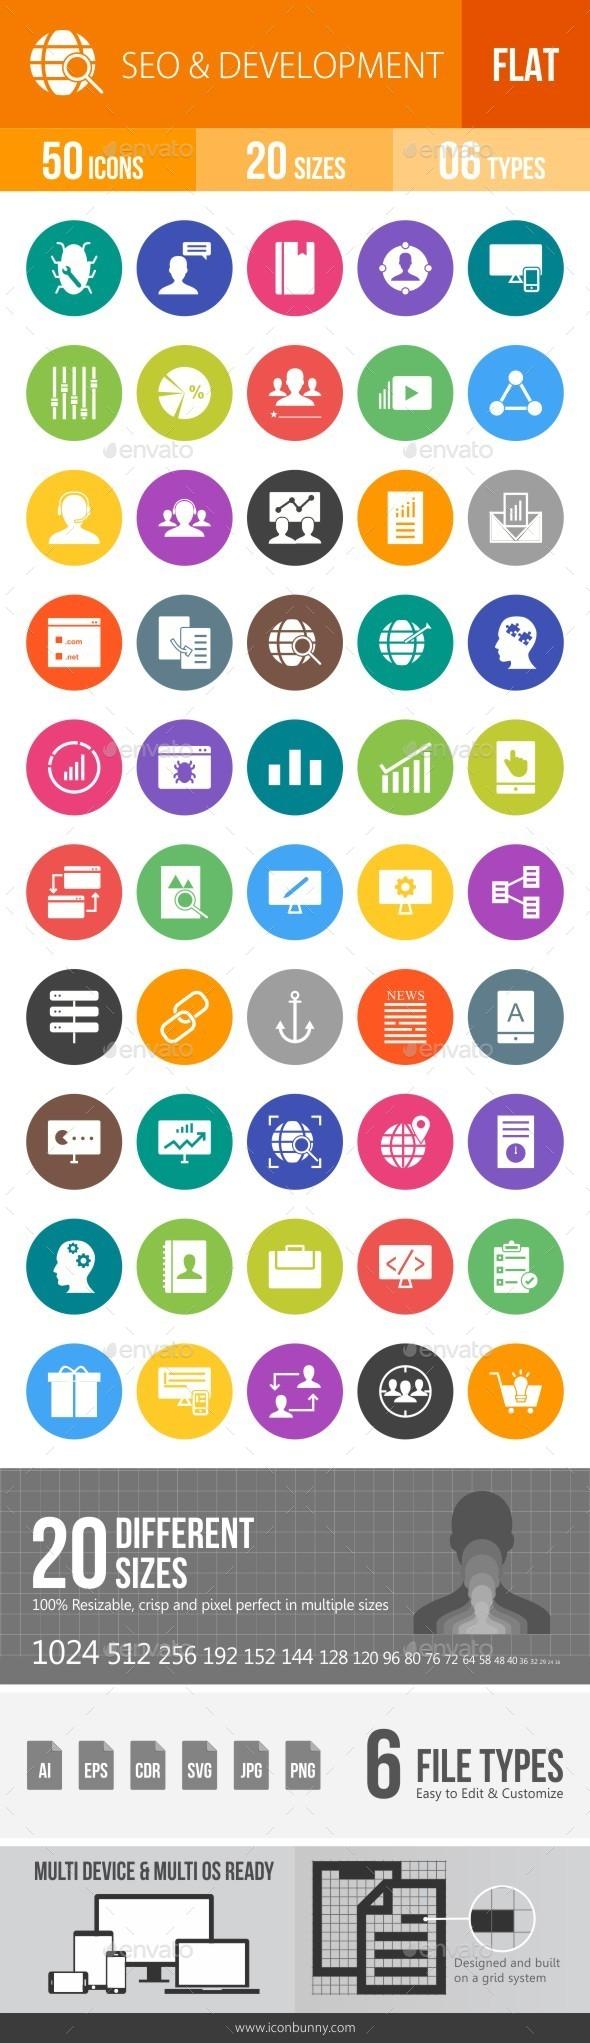 SEO & Development Services Flat Round Icons - Icons